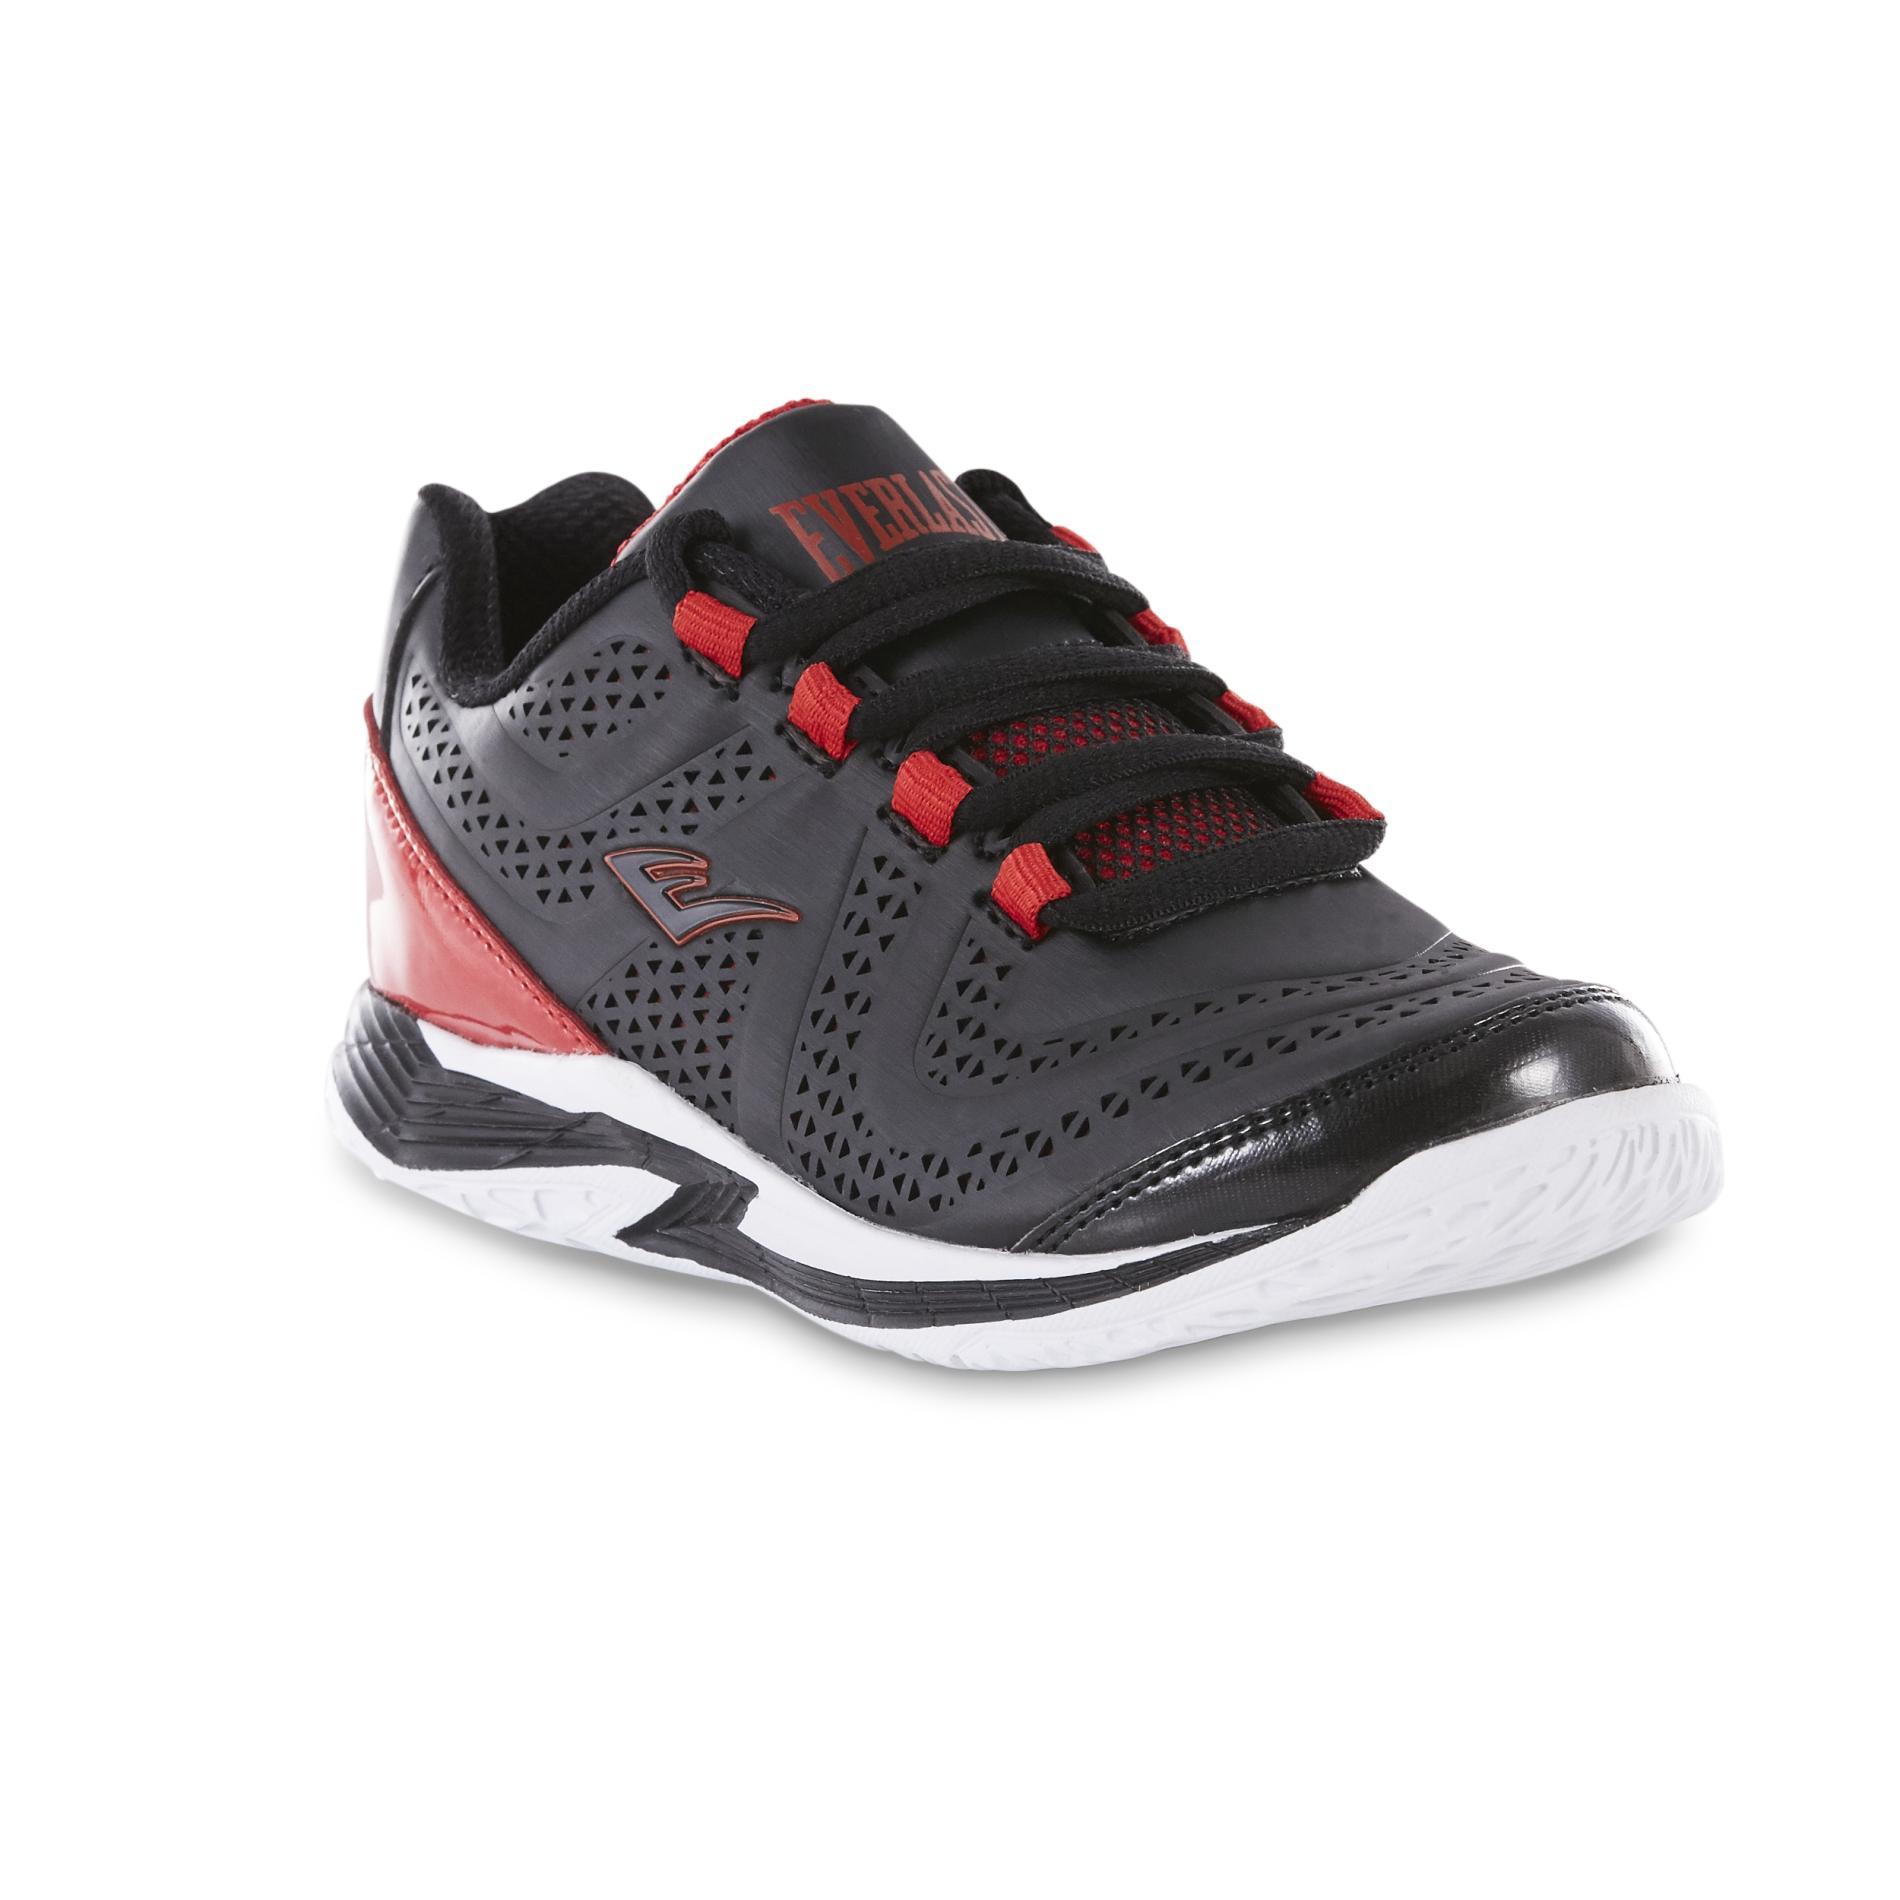 Boys' Cayenne Black/Red High-Top Basketball Shoe